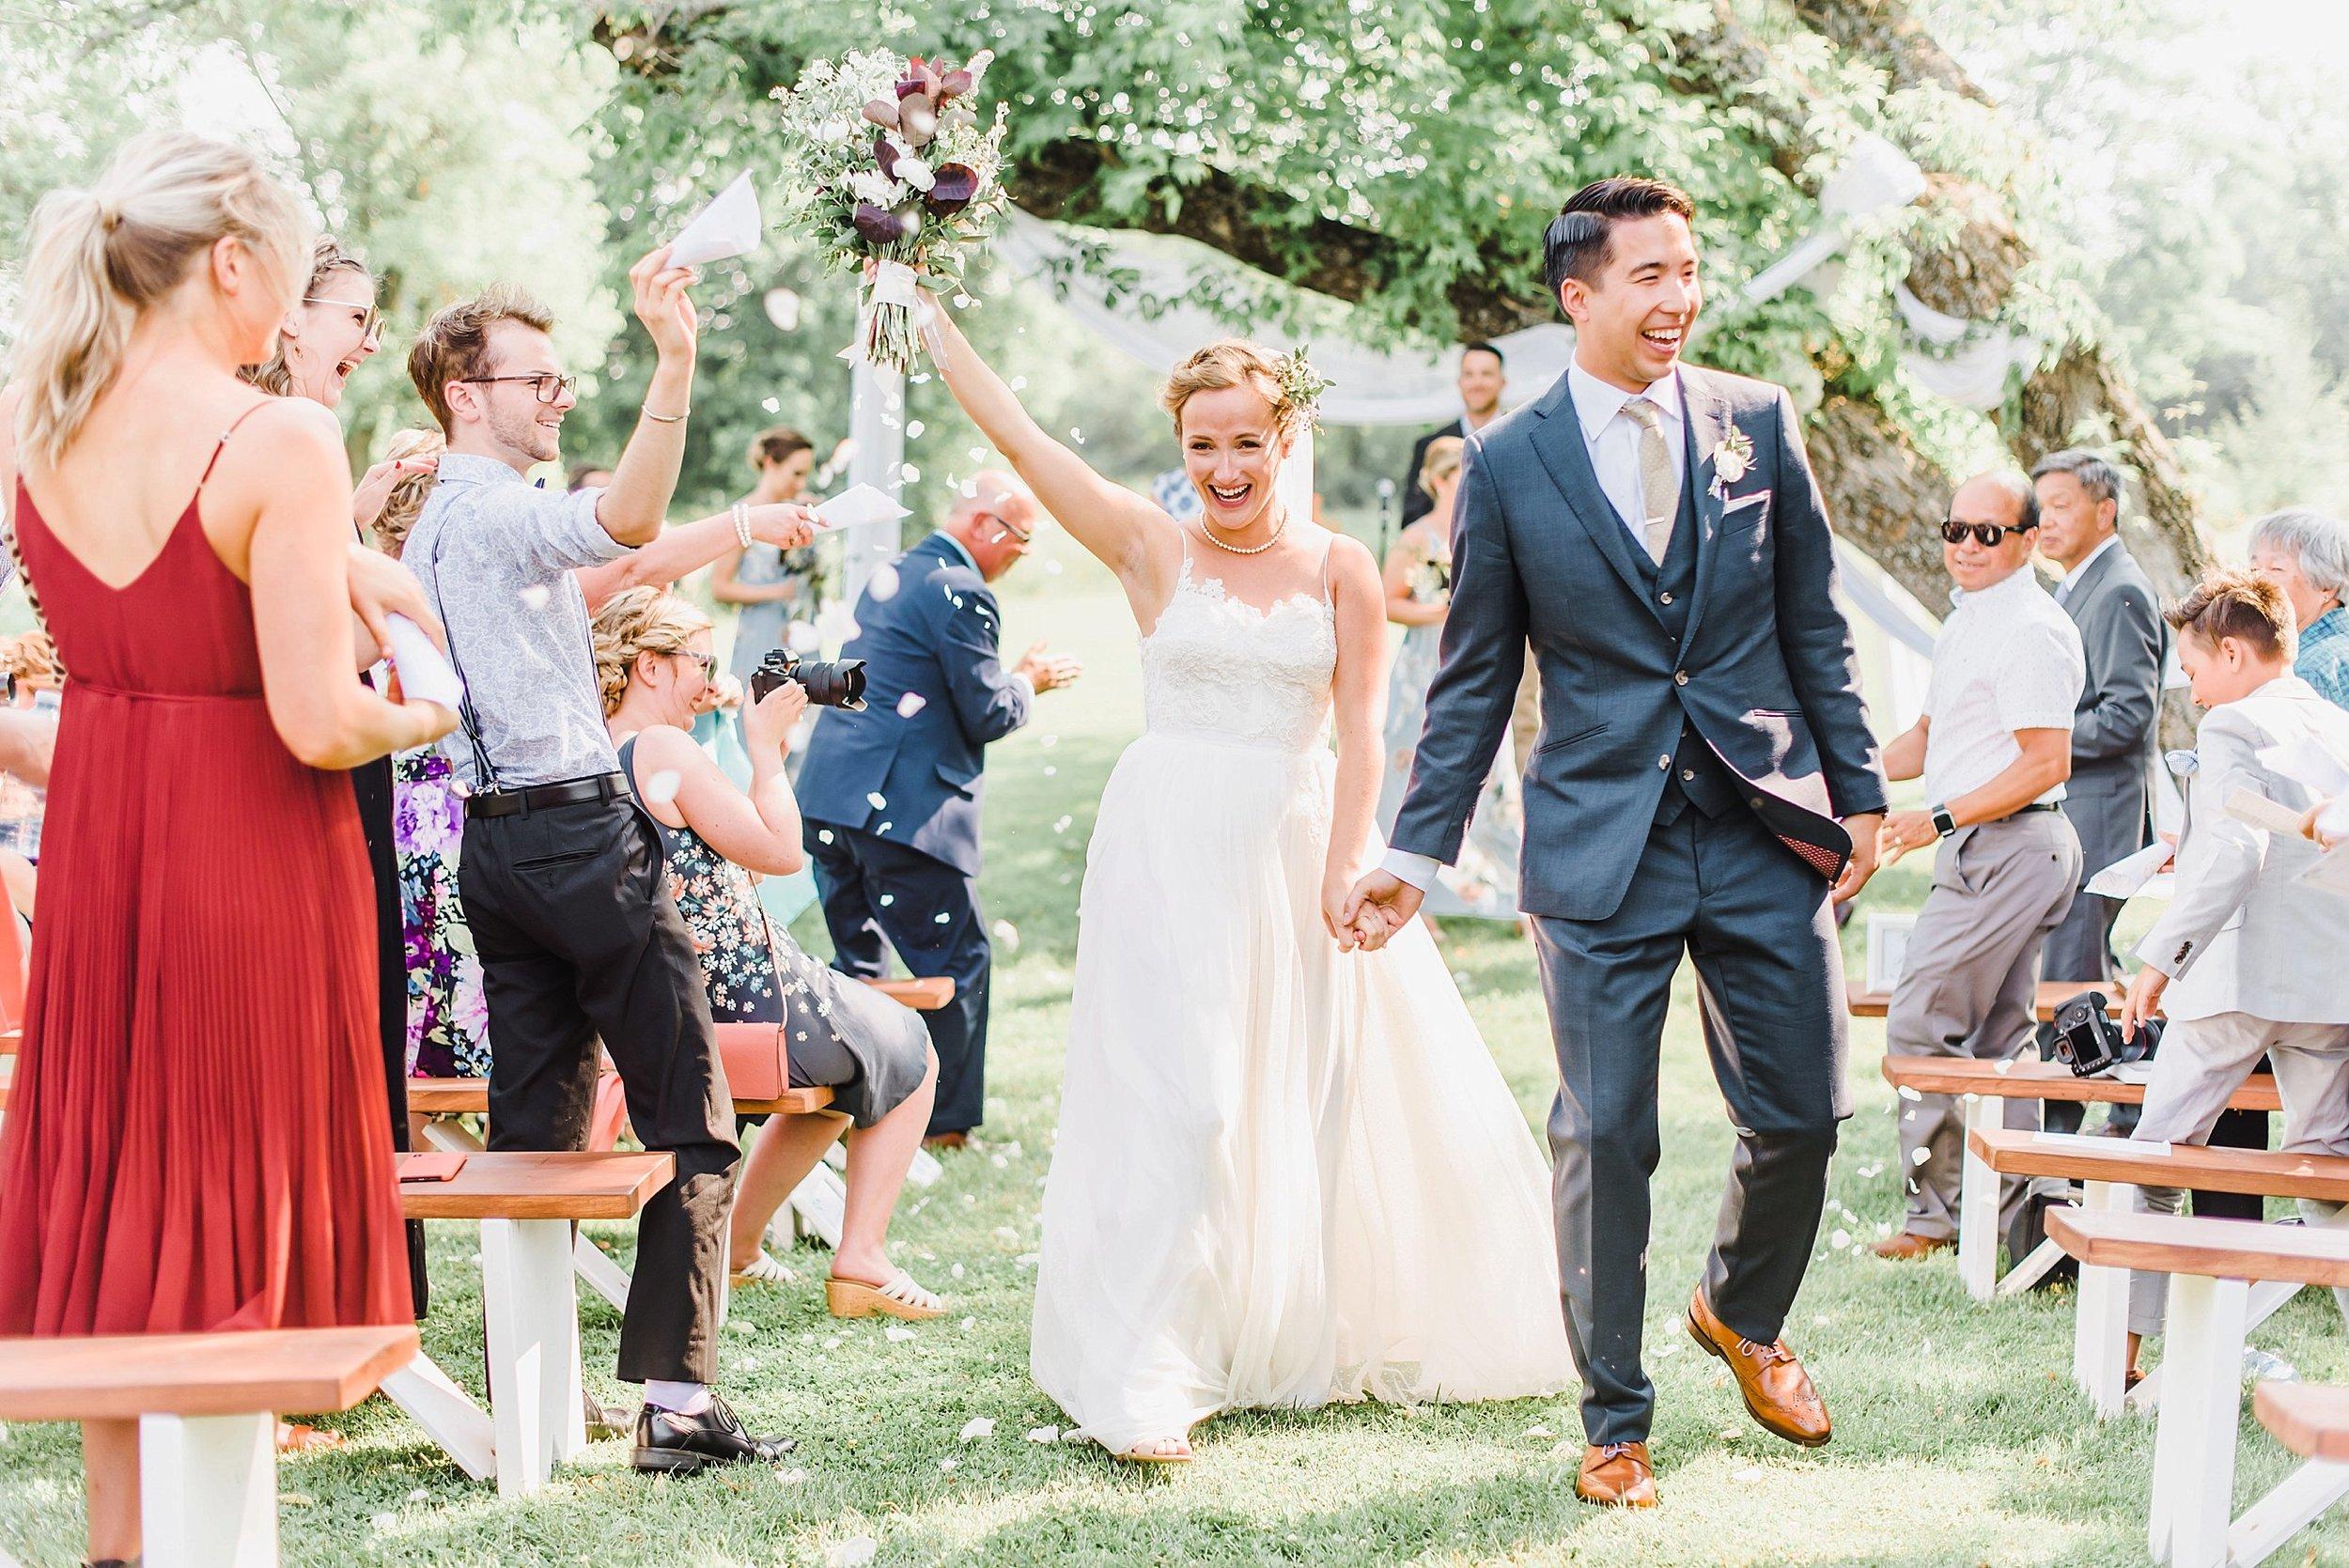 light airy indie fine art ottawa wedding photographer | Ali and Batoul Photography_0818.jpg